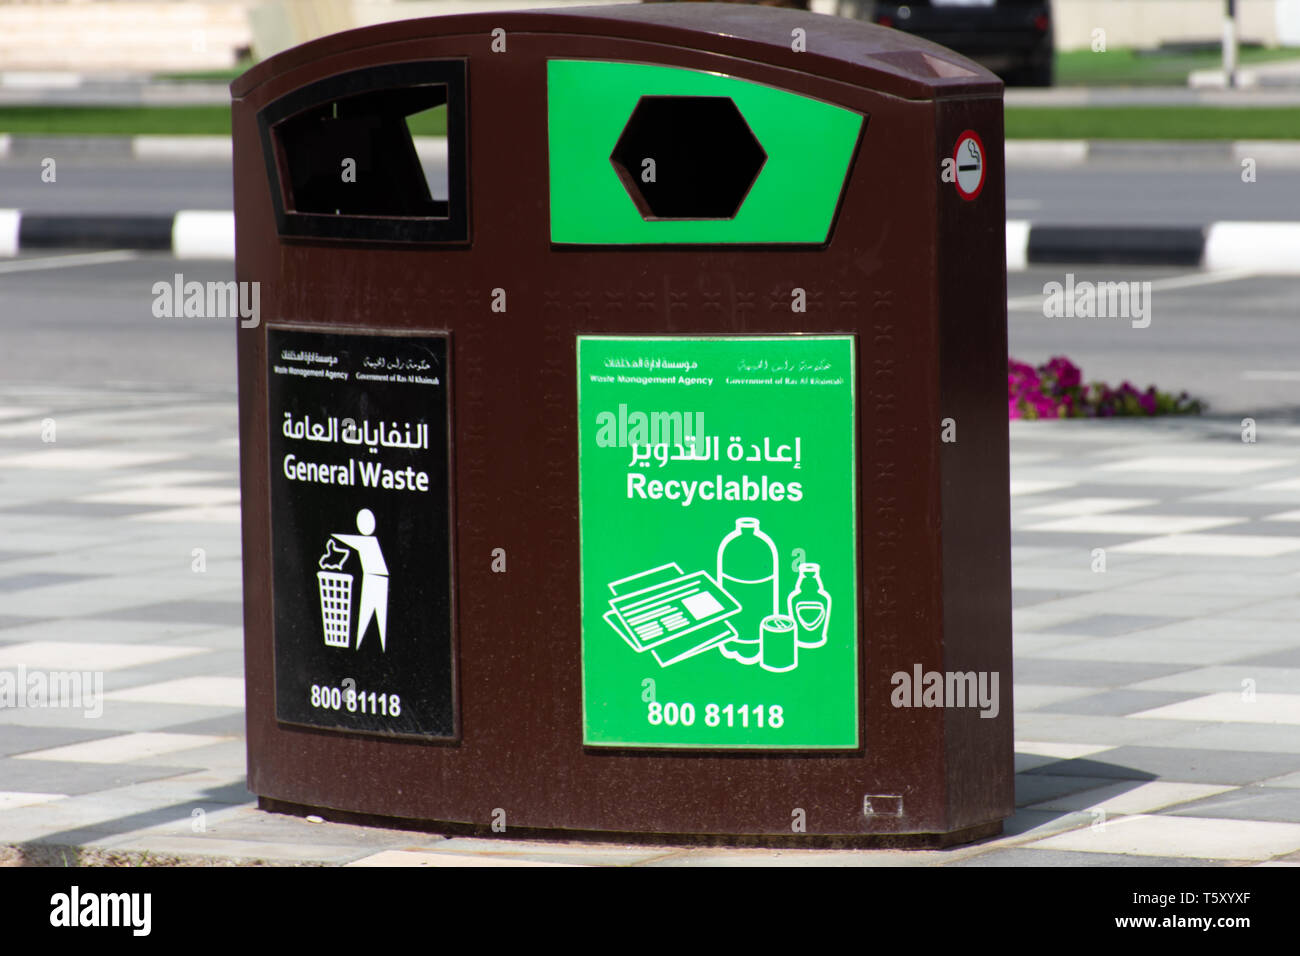 'Ras al Khaimah, Ras al Khaimah/United Arab Emirates - 3/31/2019: 'RAK Recycles Garbage Cans Center on the Corniche on a sunny day. ' - Stock Image